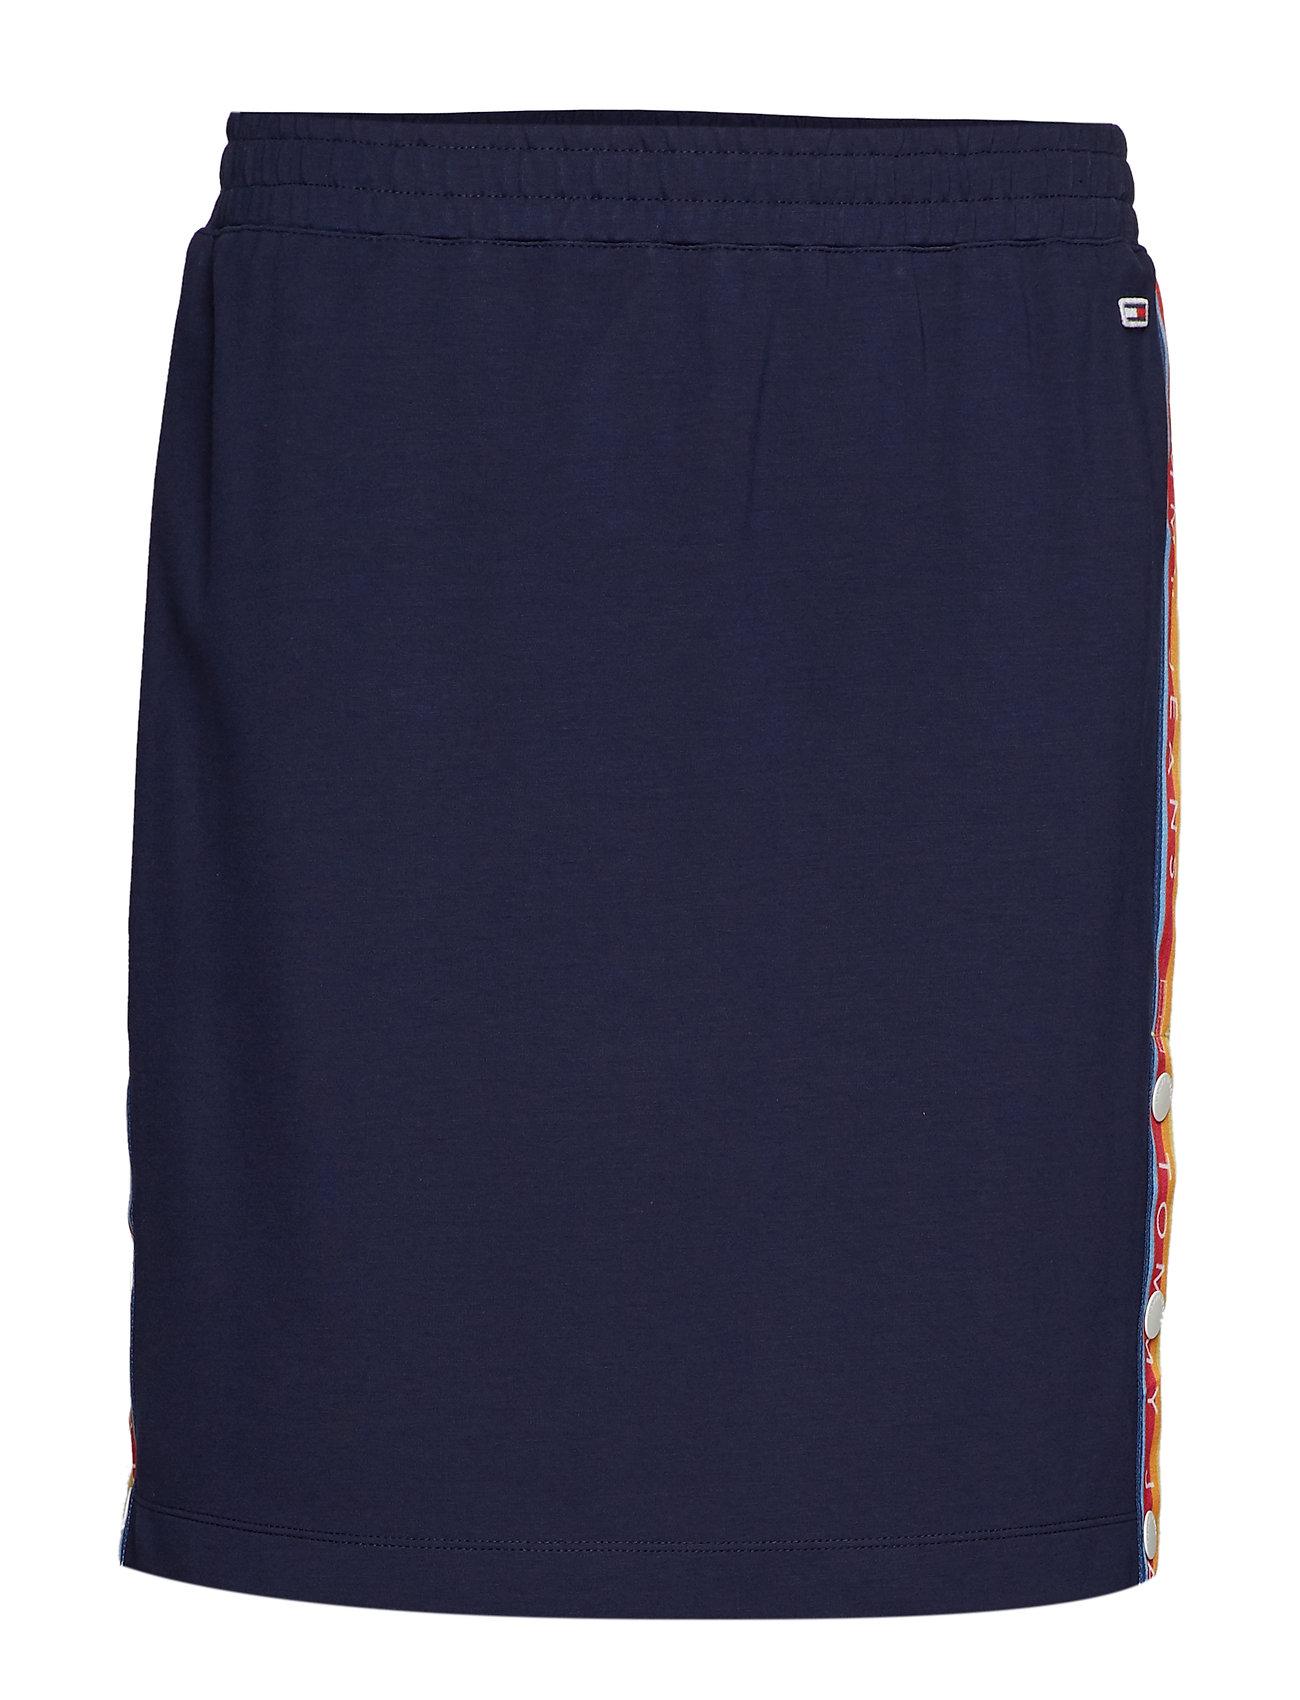 Tommy Jeans TJW POPPER TRACK SKIRT - BLACK IRIS